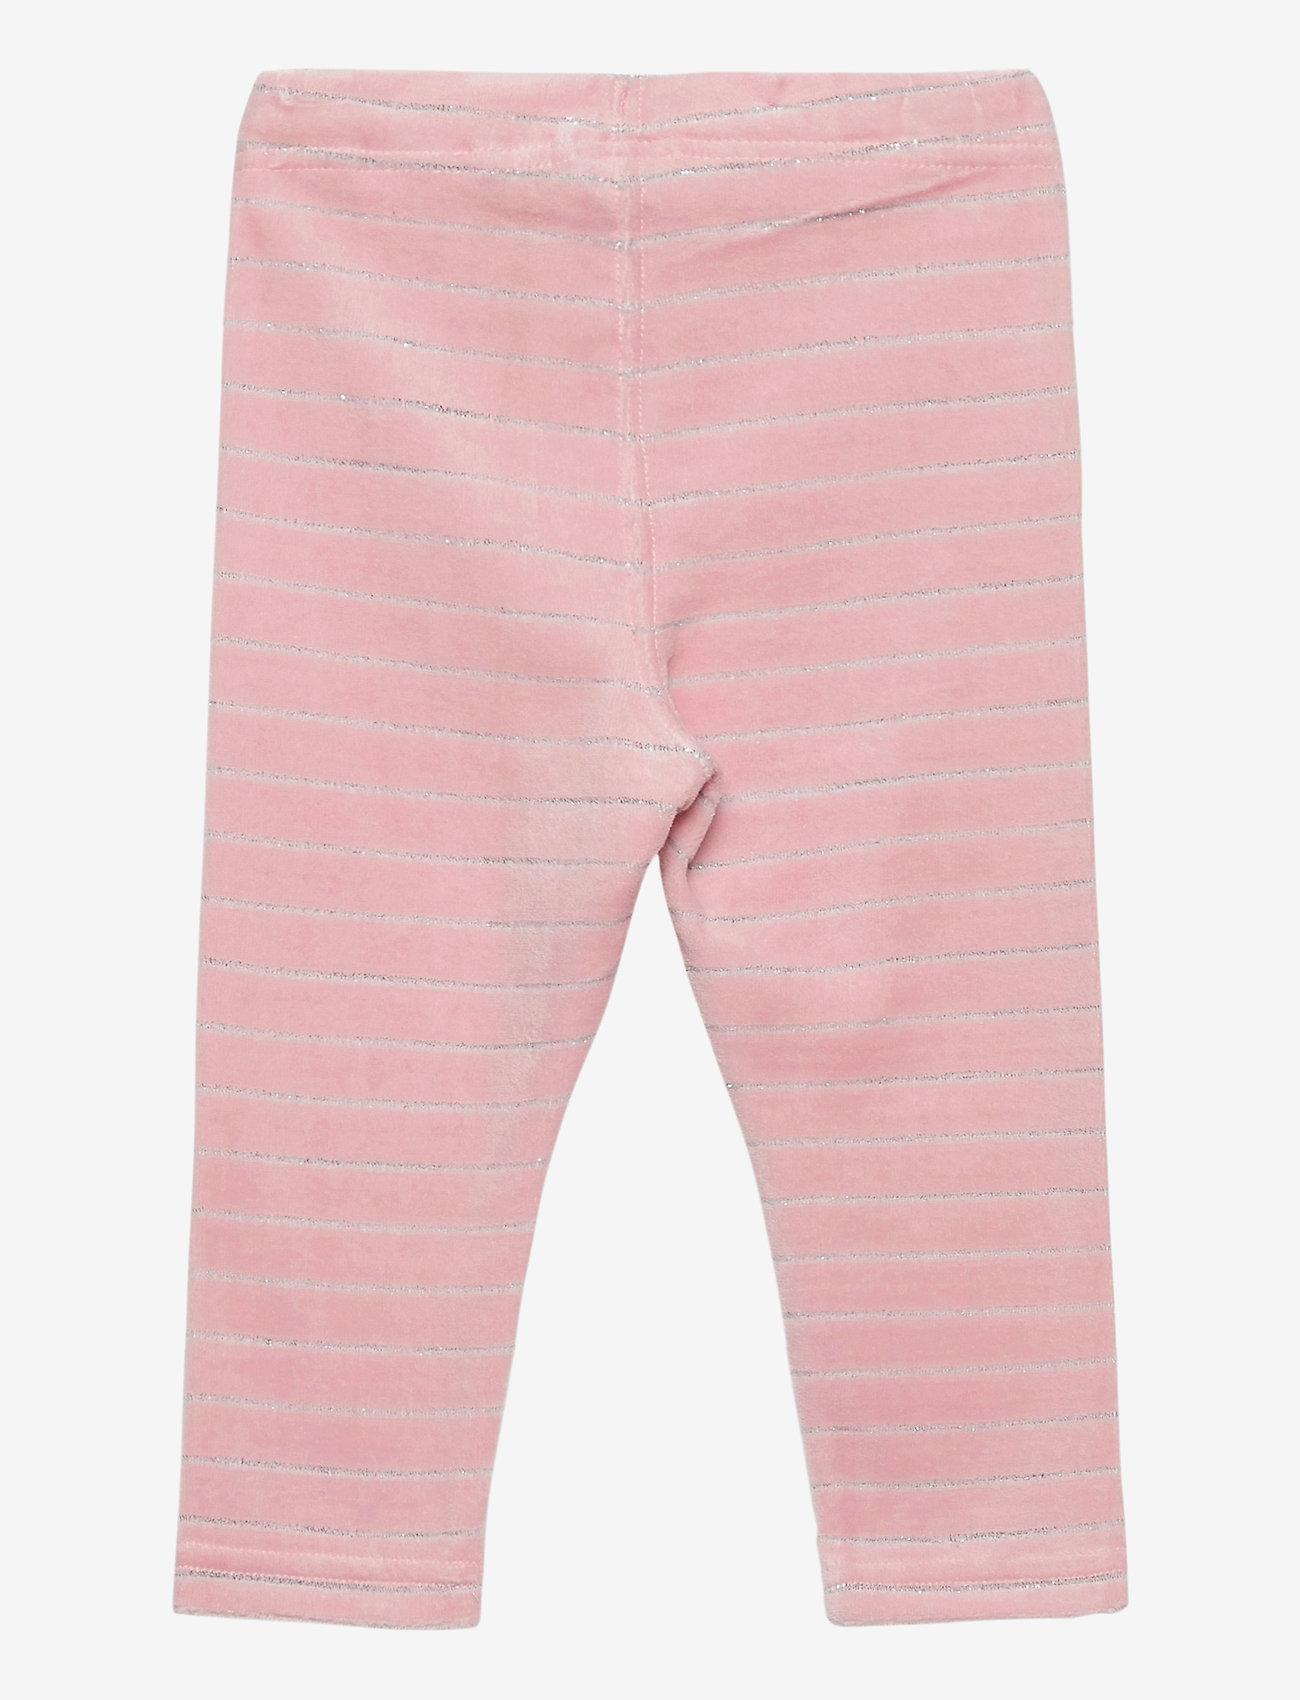 Trousers Velour Preschool (Tobago) (37.90 €) - Polarn O. Pyret 61a8r